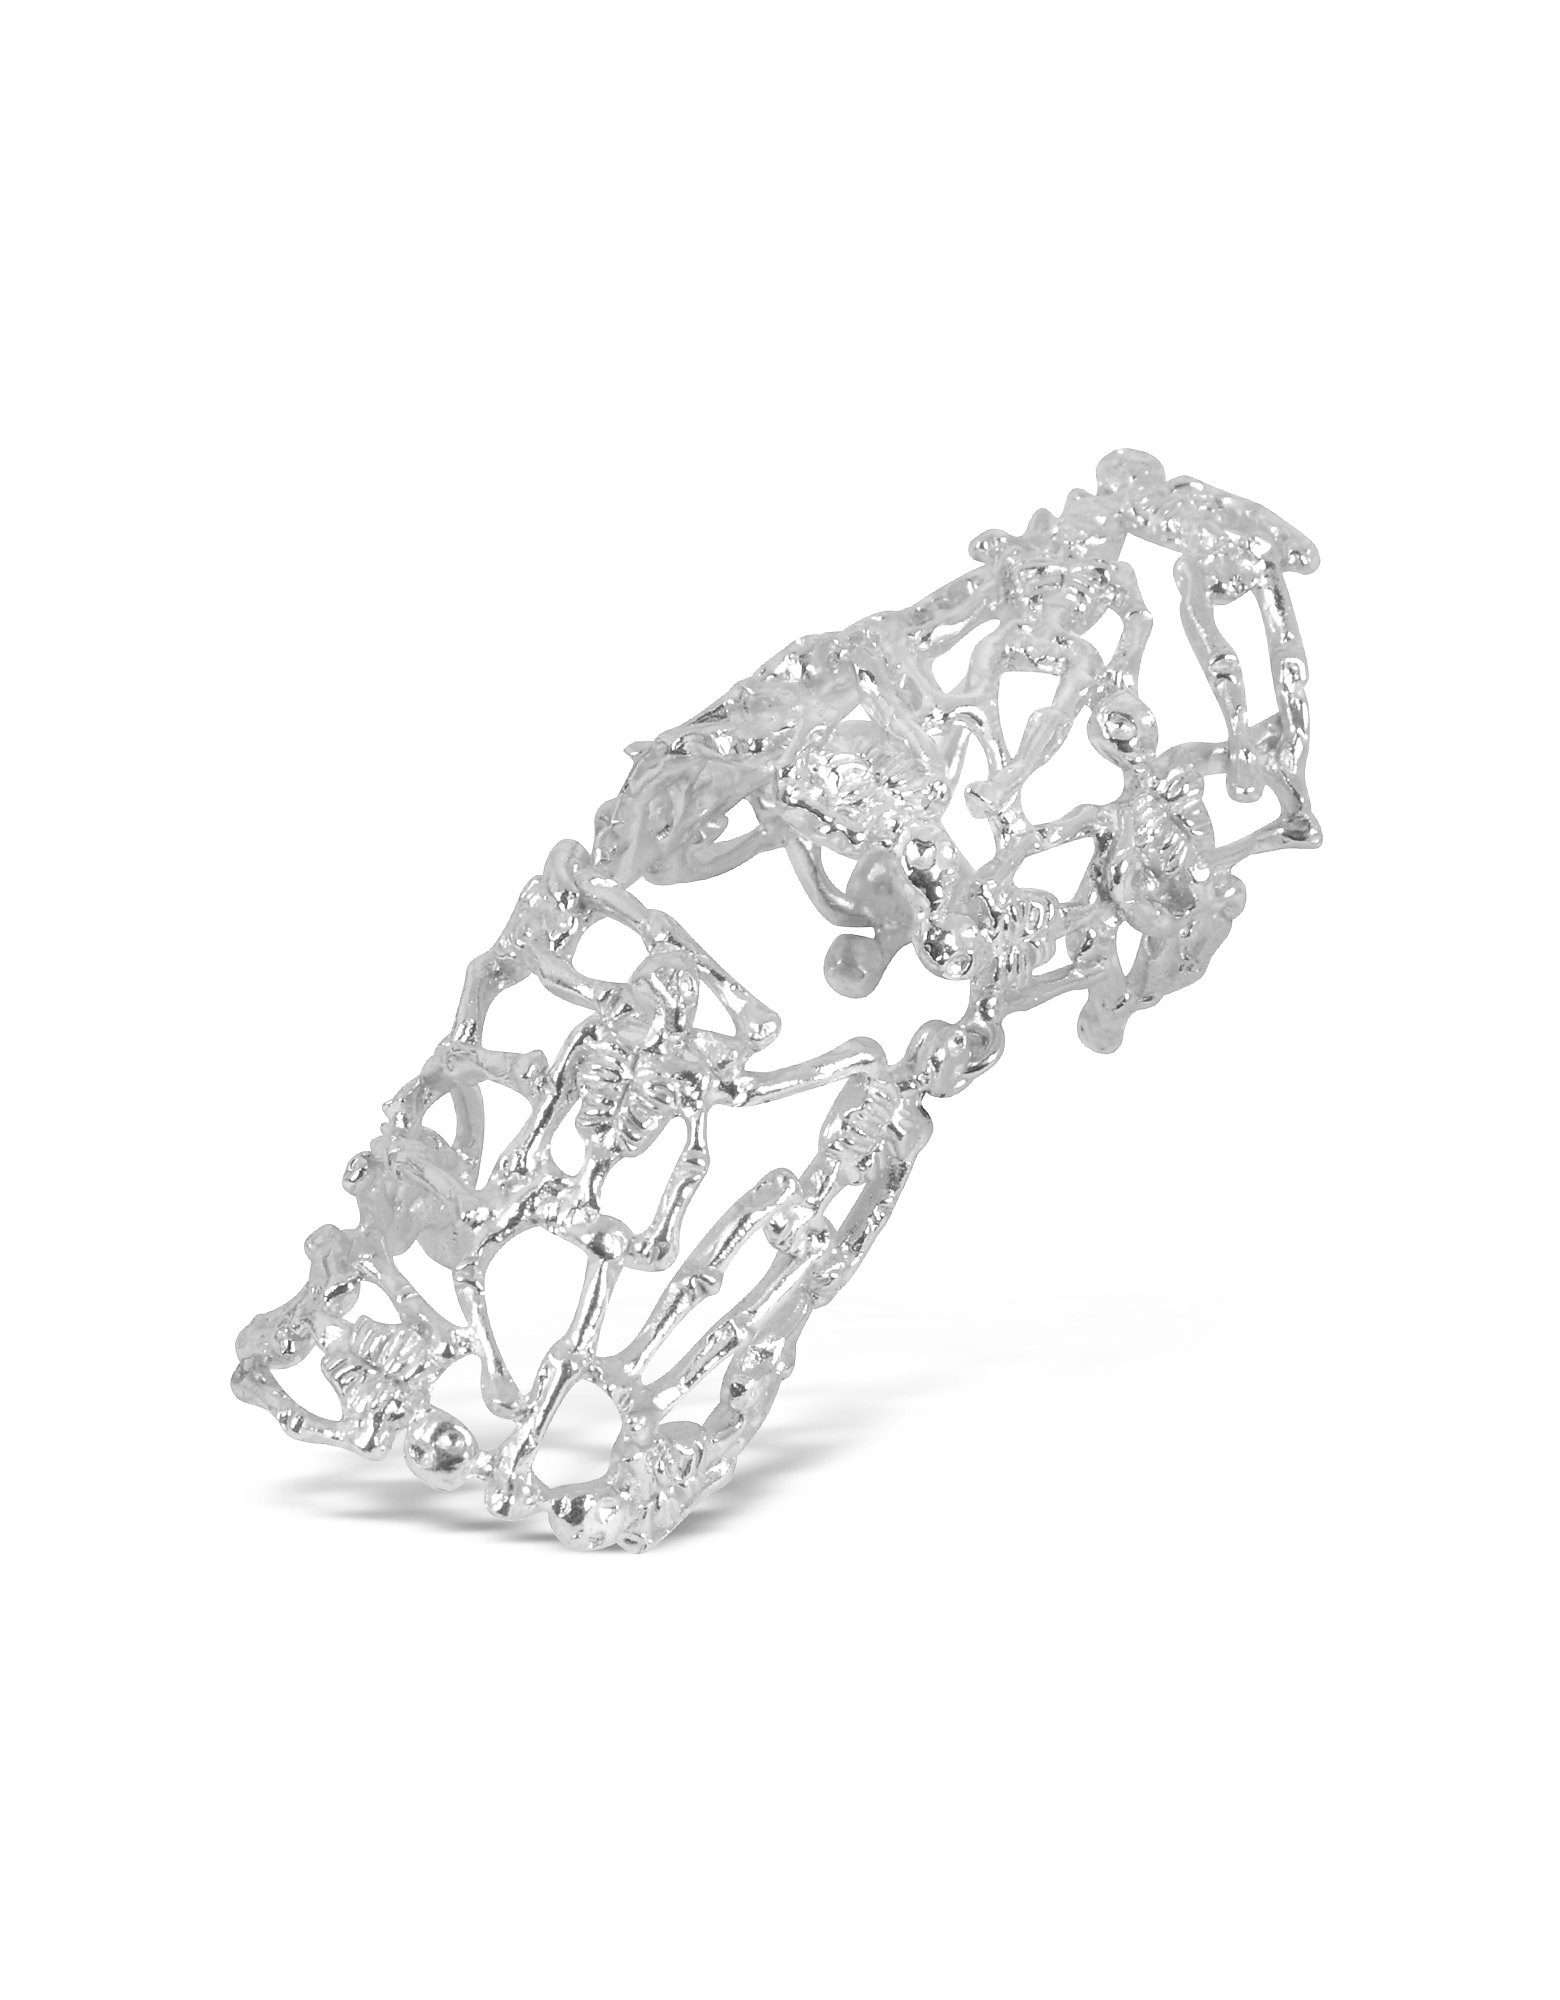 Bernard Delettrez Rings, Skeletons Silver Metal Articulated Ring